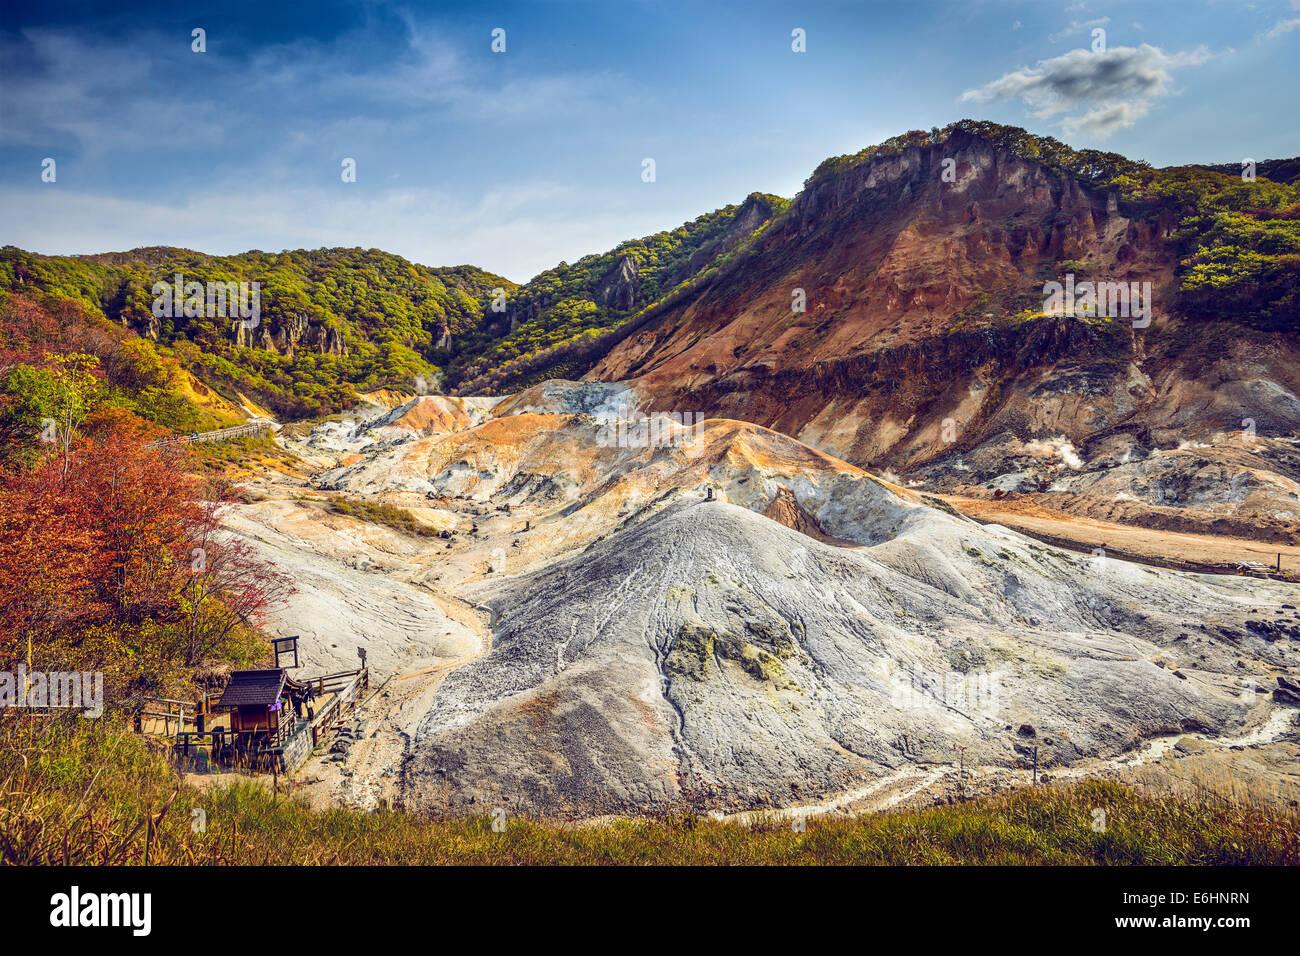 Noboribetsu, Hokkaido, Japan at Jigokudani Hell Valley. - Stock Image